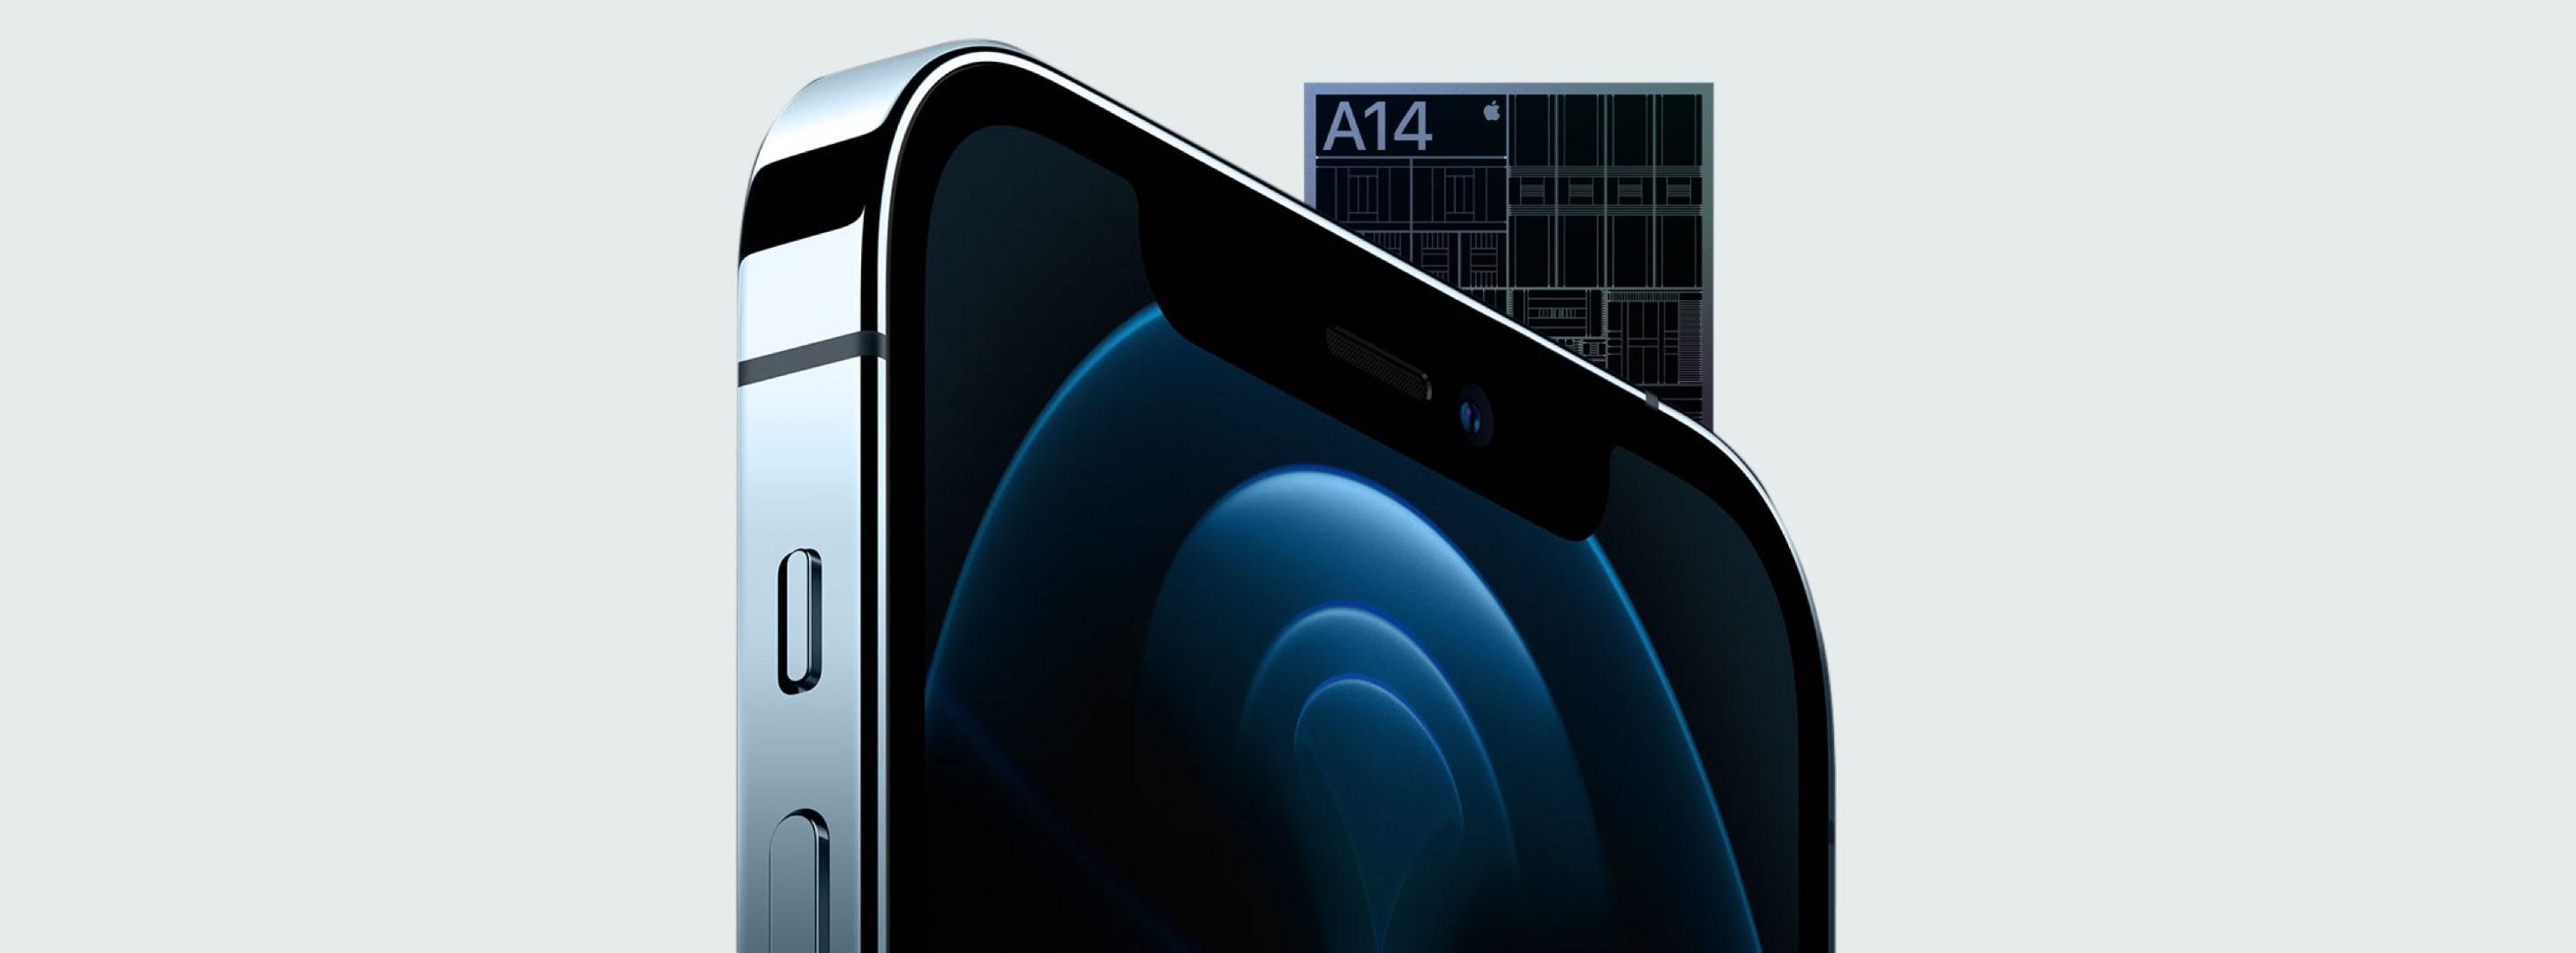 allapplenews-iphone-12-pro-processing-chip